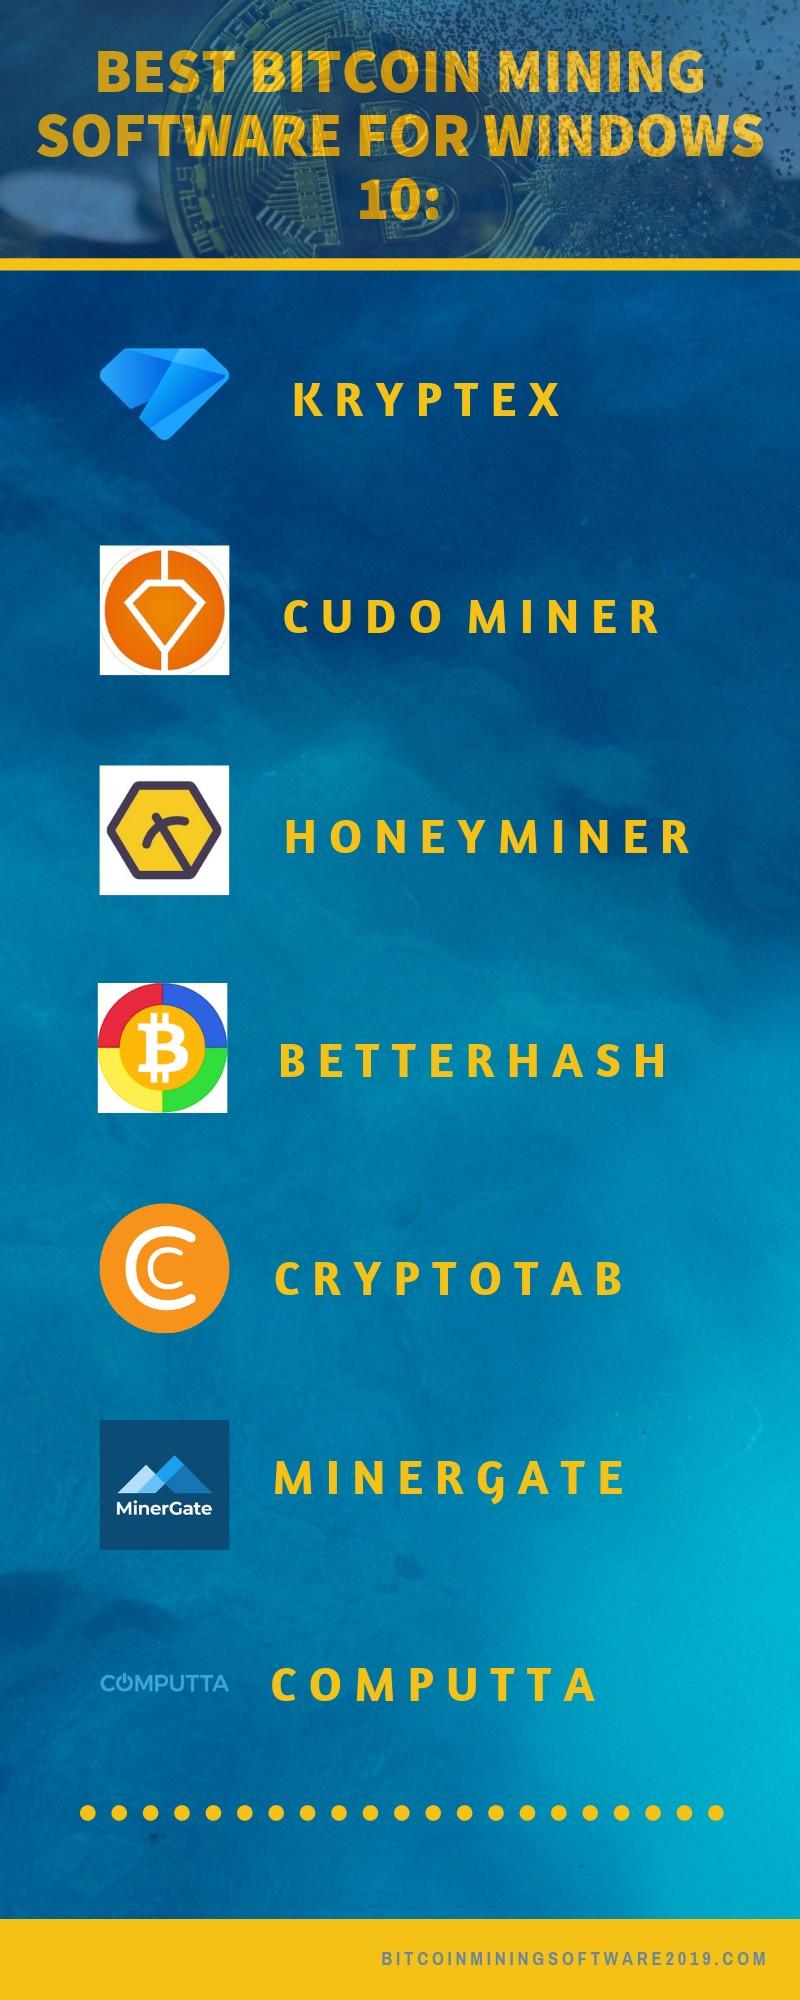 Best Bitcoin Mining Software for Windows 10